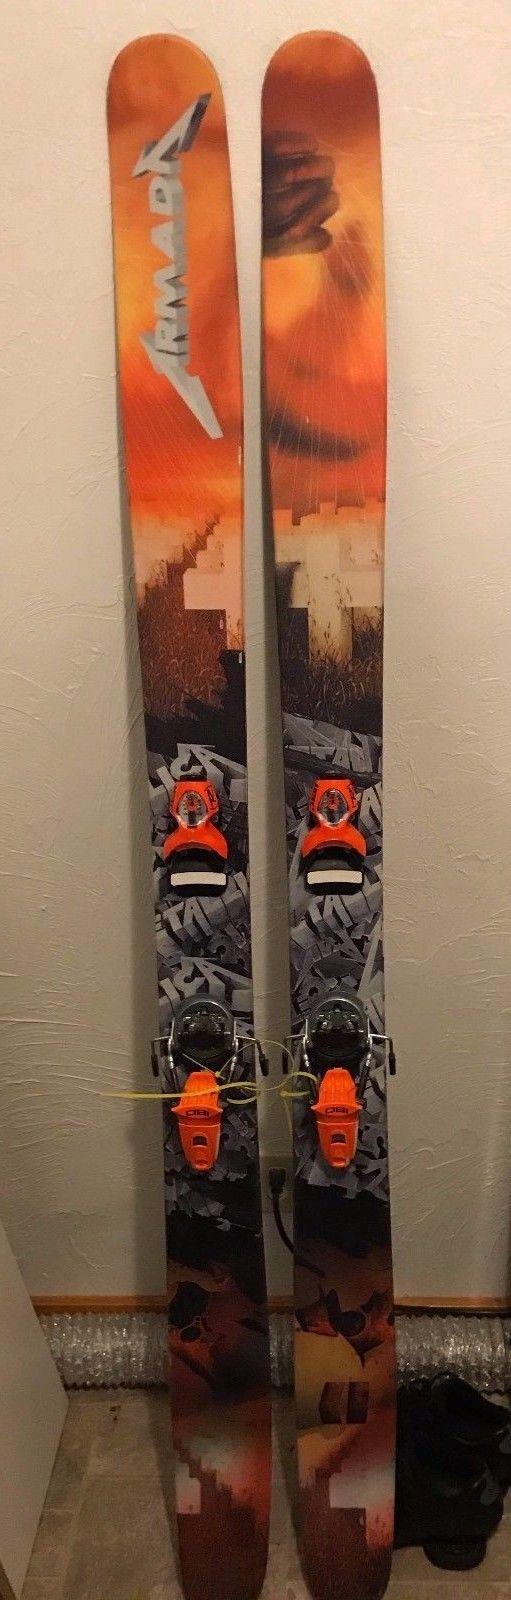 Armada JJ 2.0 195cm Metallica special edition skis, Rossignol FKS 180 bindings